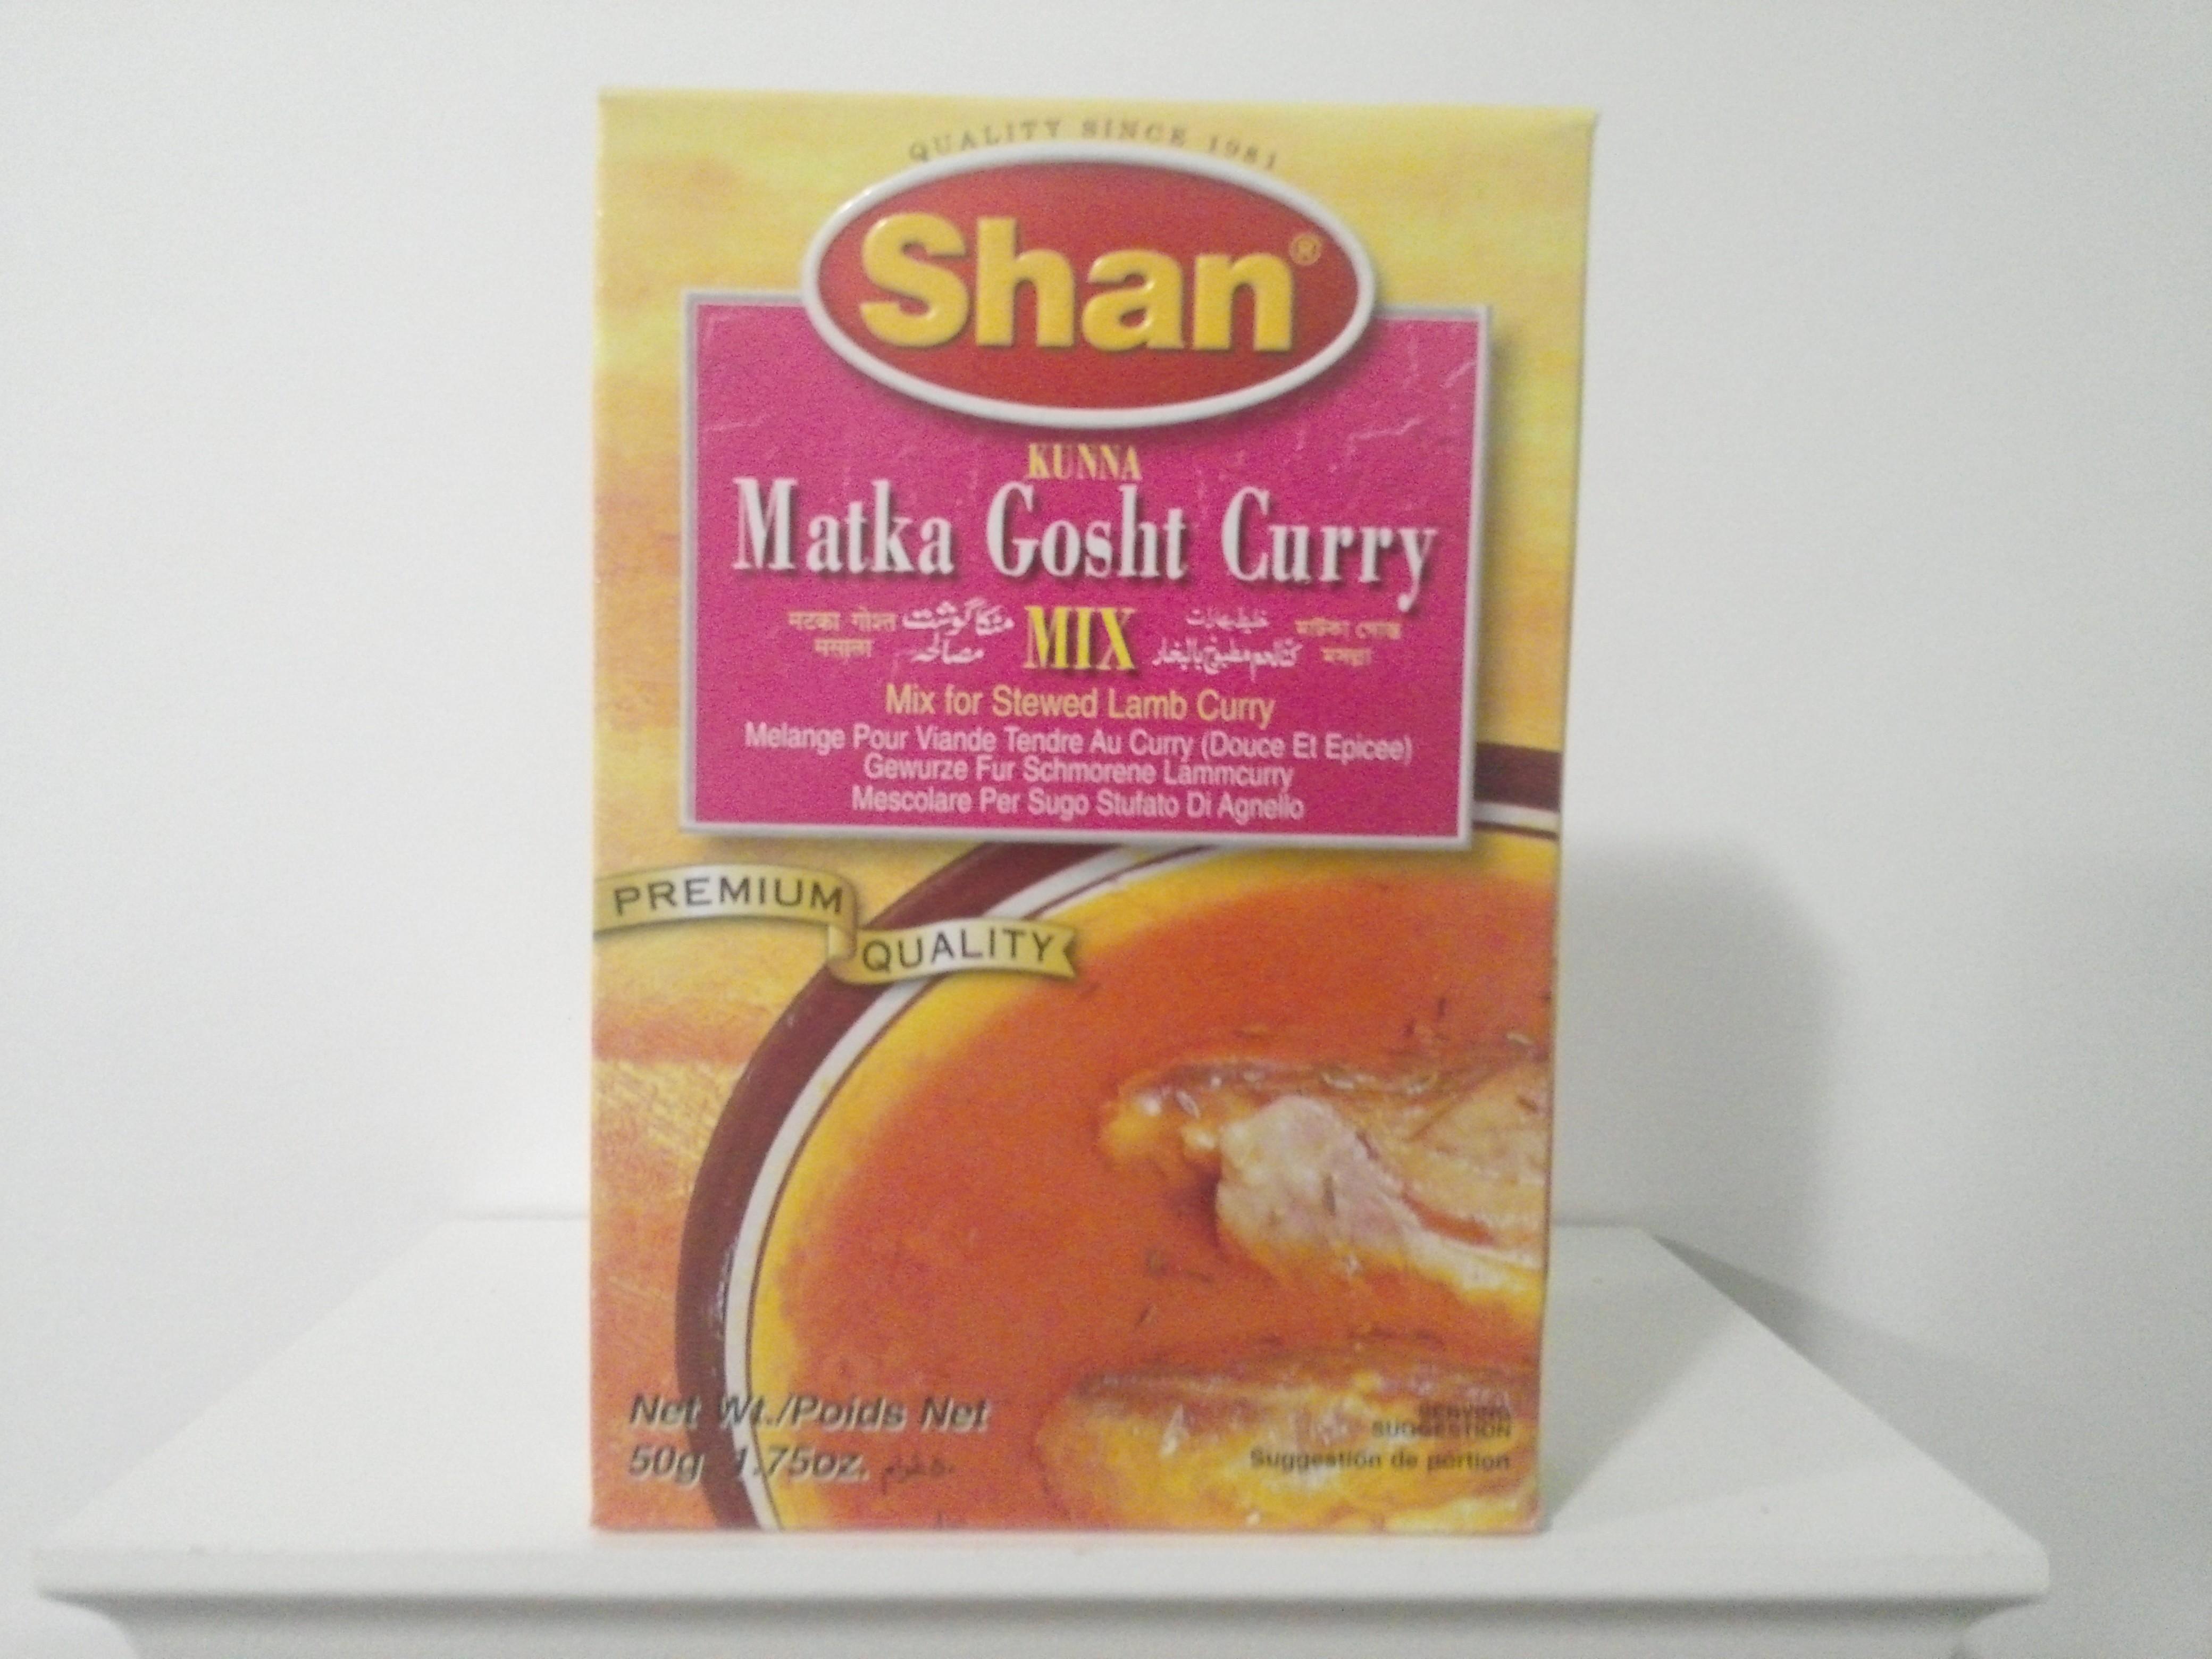 Shan Matka Gosht Curry Spice Mix 50 grm